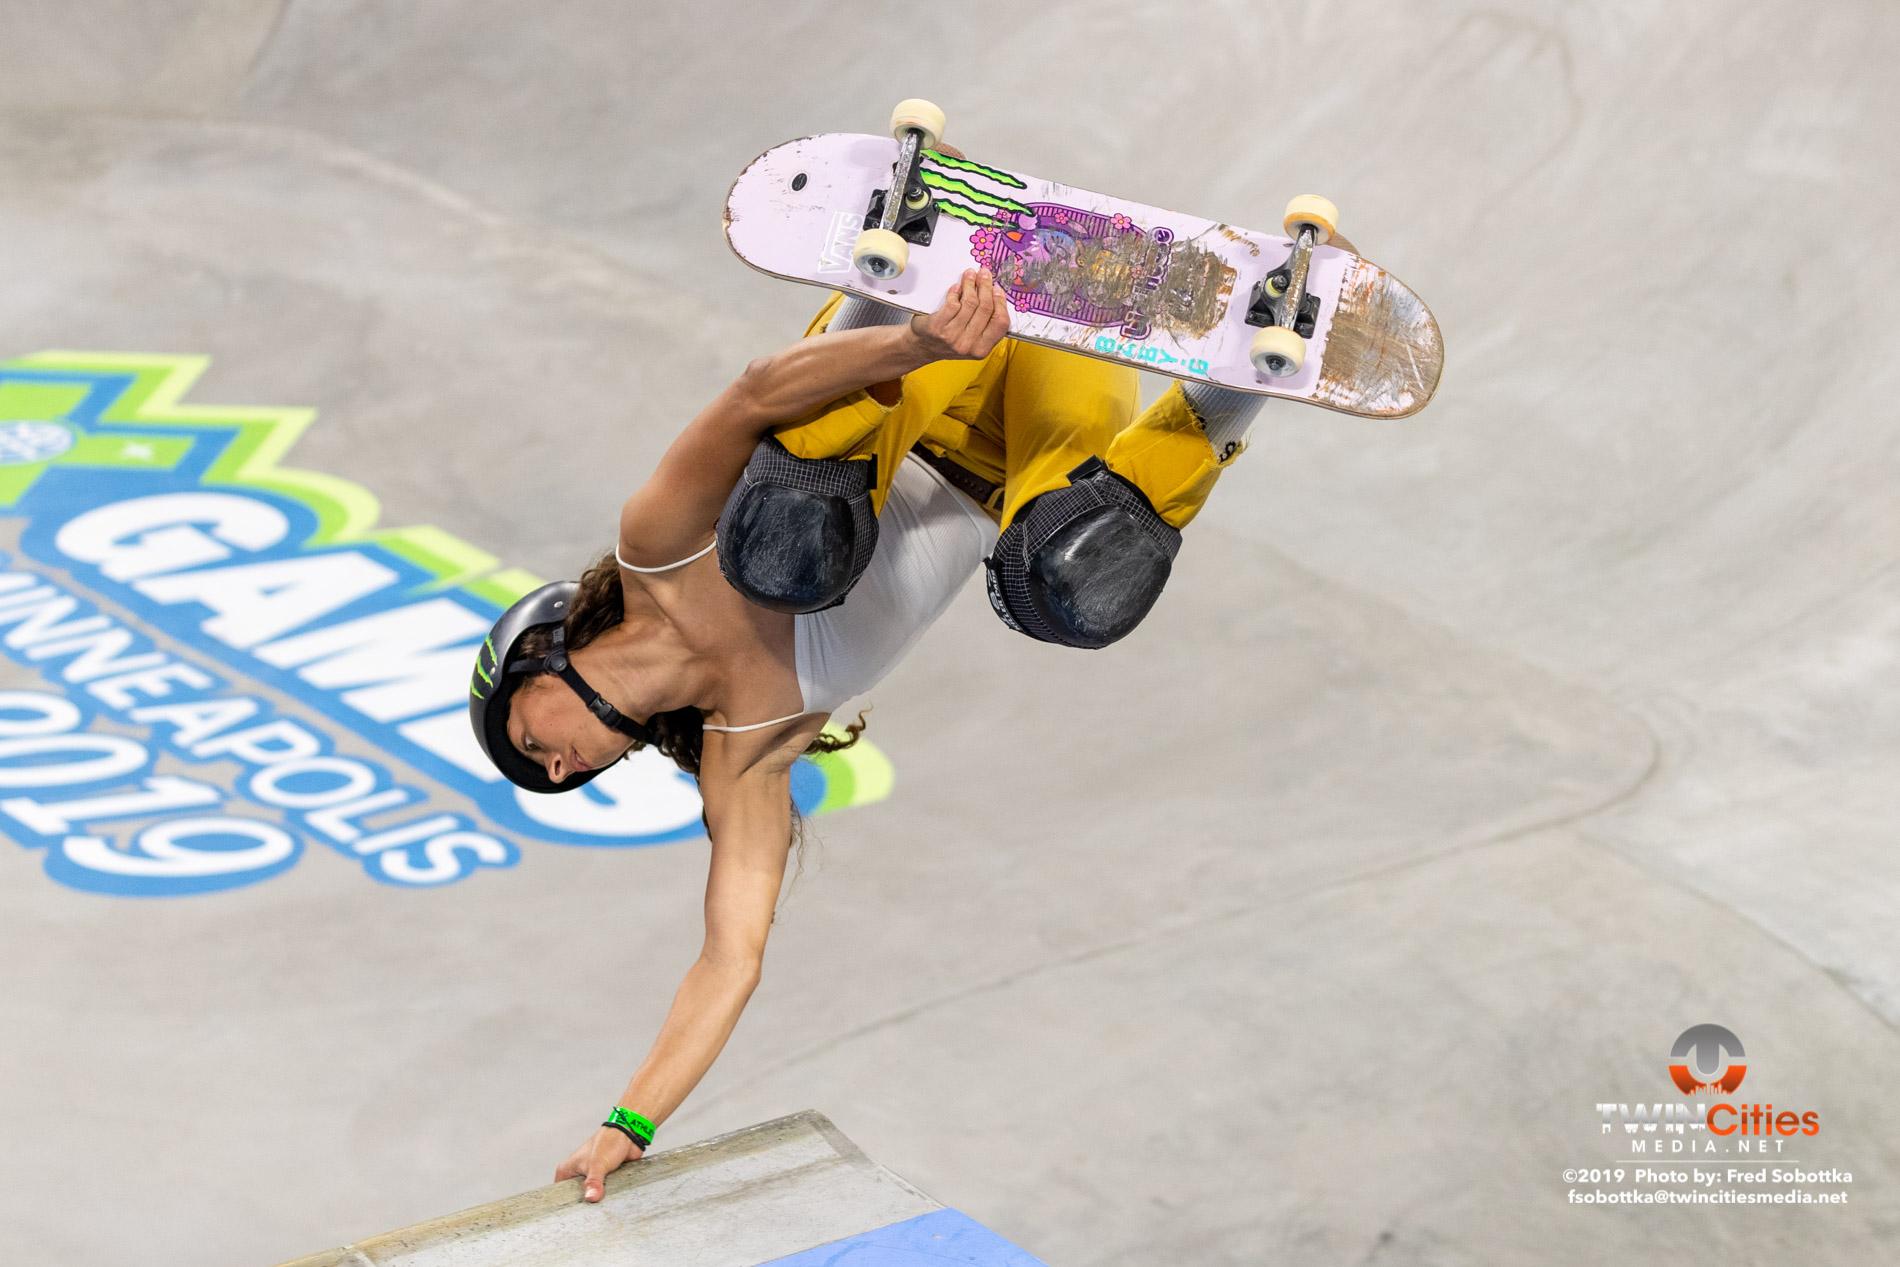 Womens-Skateboard-Park-13